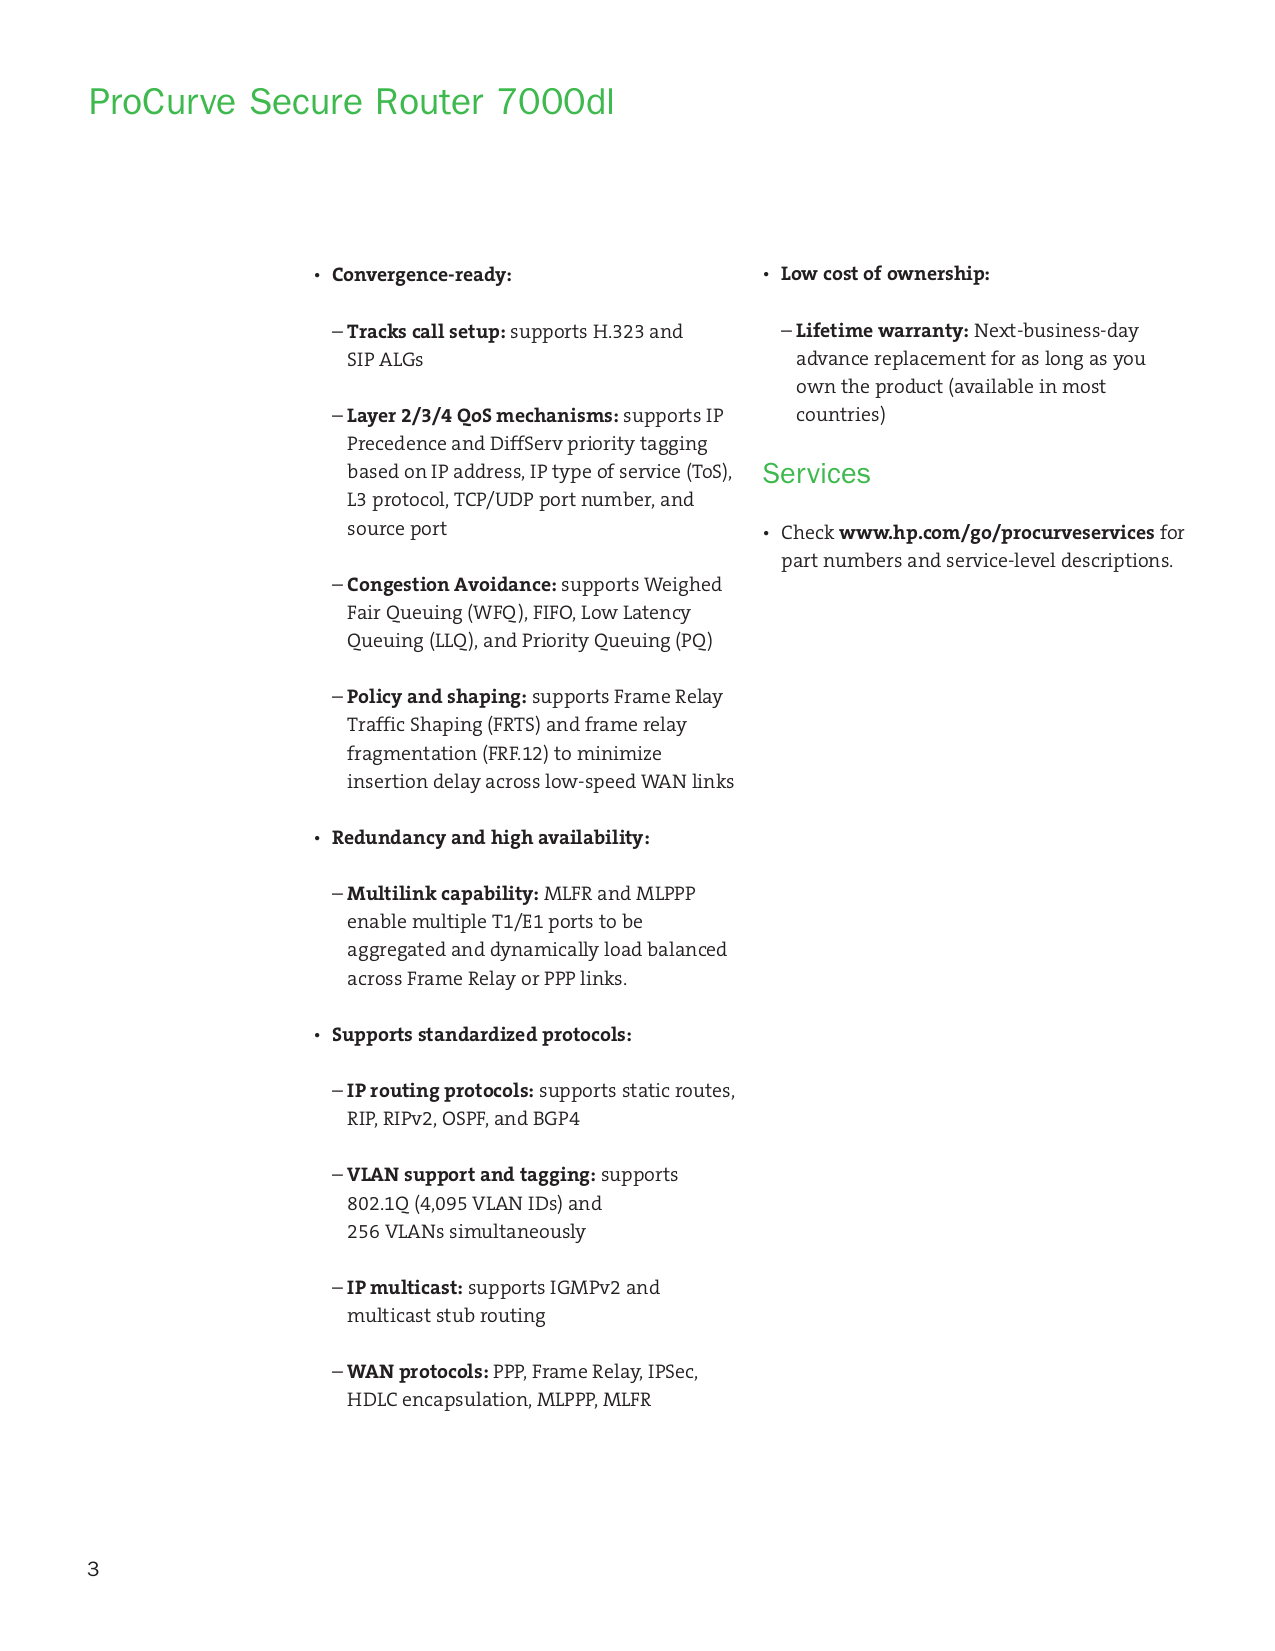 PDF manual for HP Router ProCurve J8463A